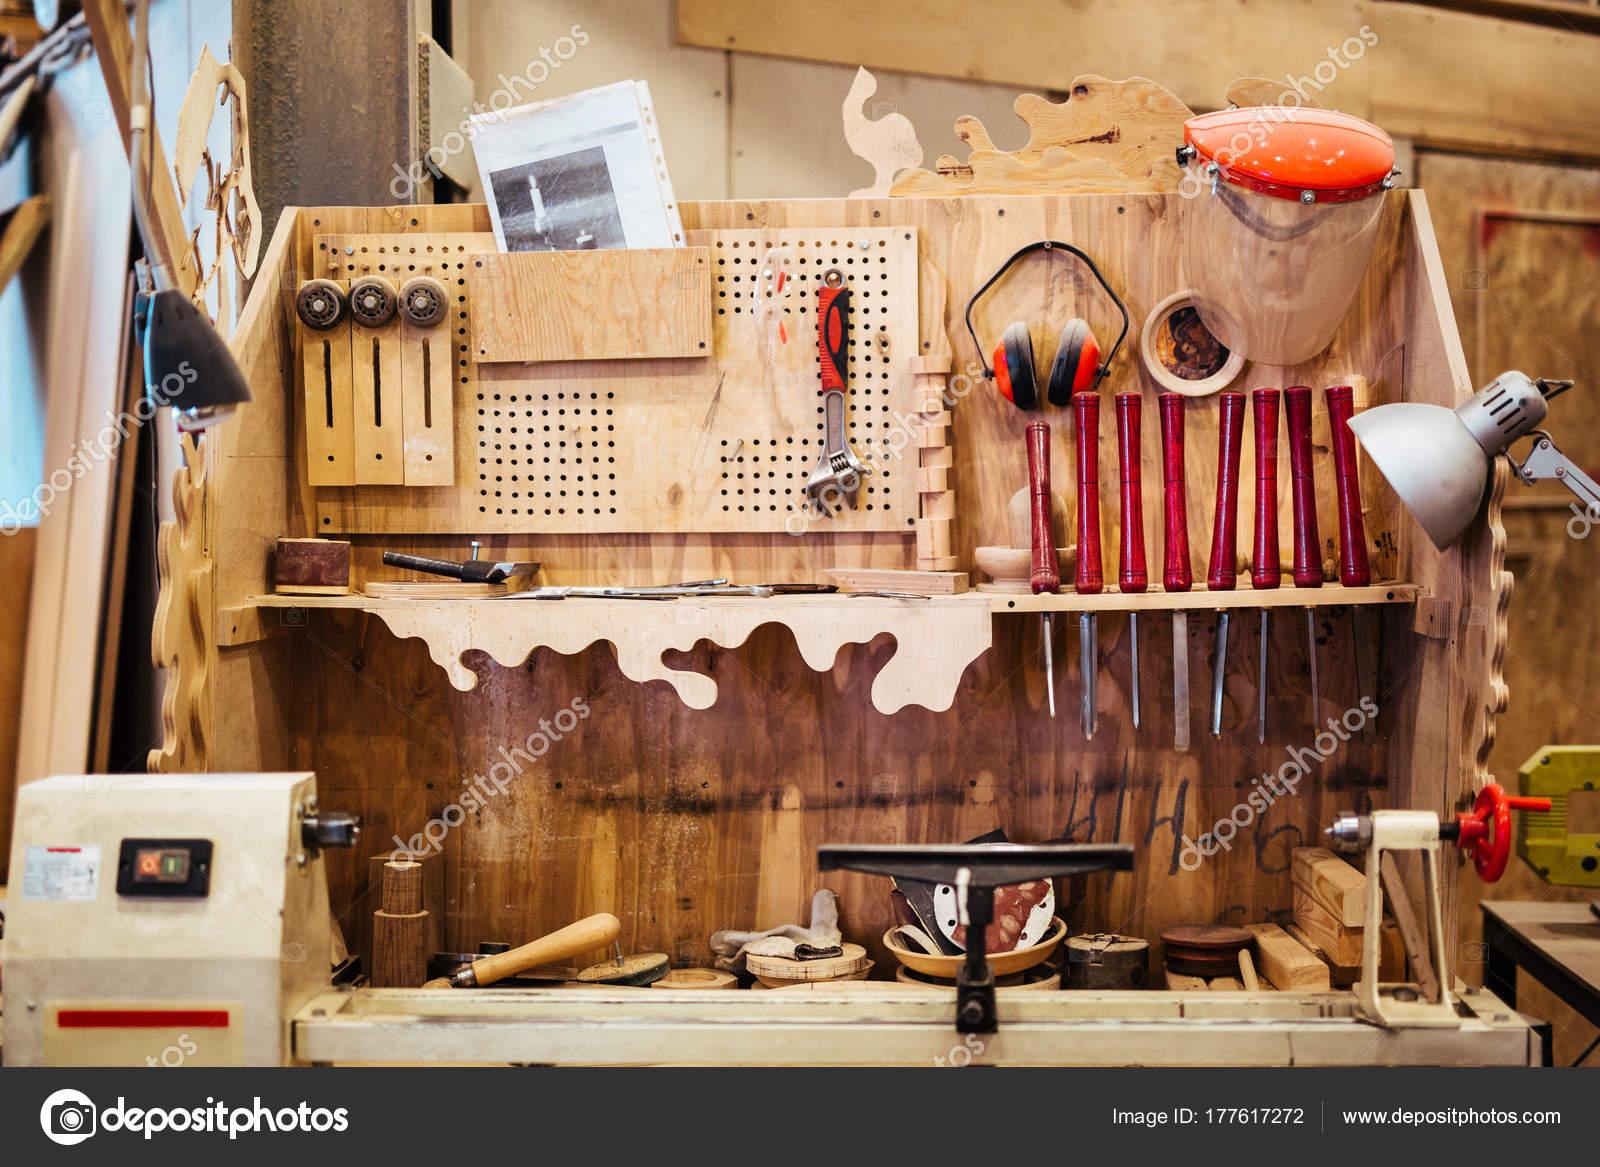 Background Image Woodworking Workshop Carpenters Work Table